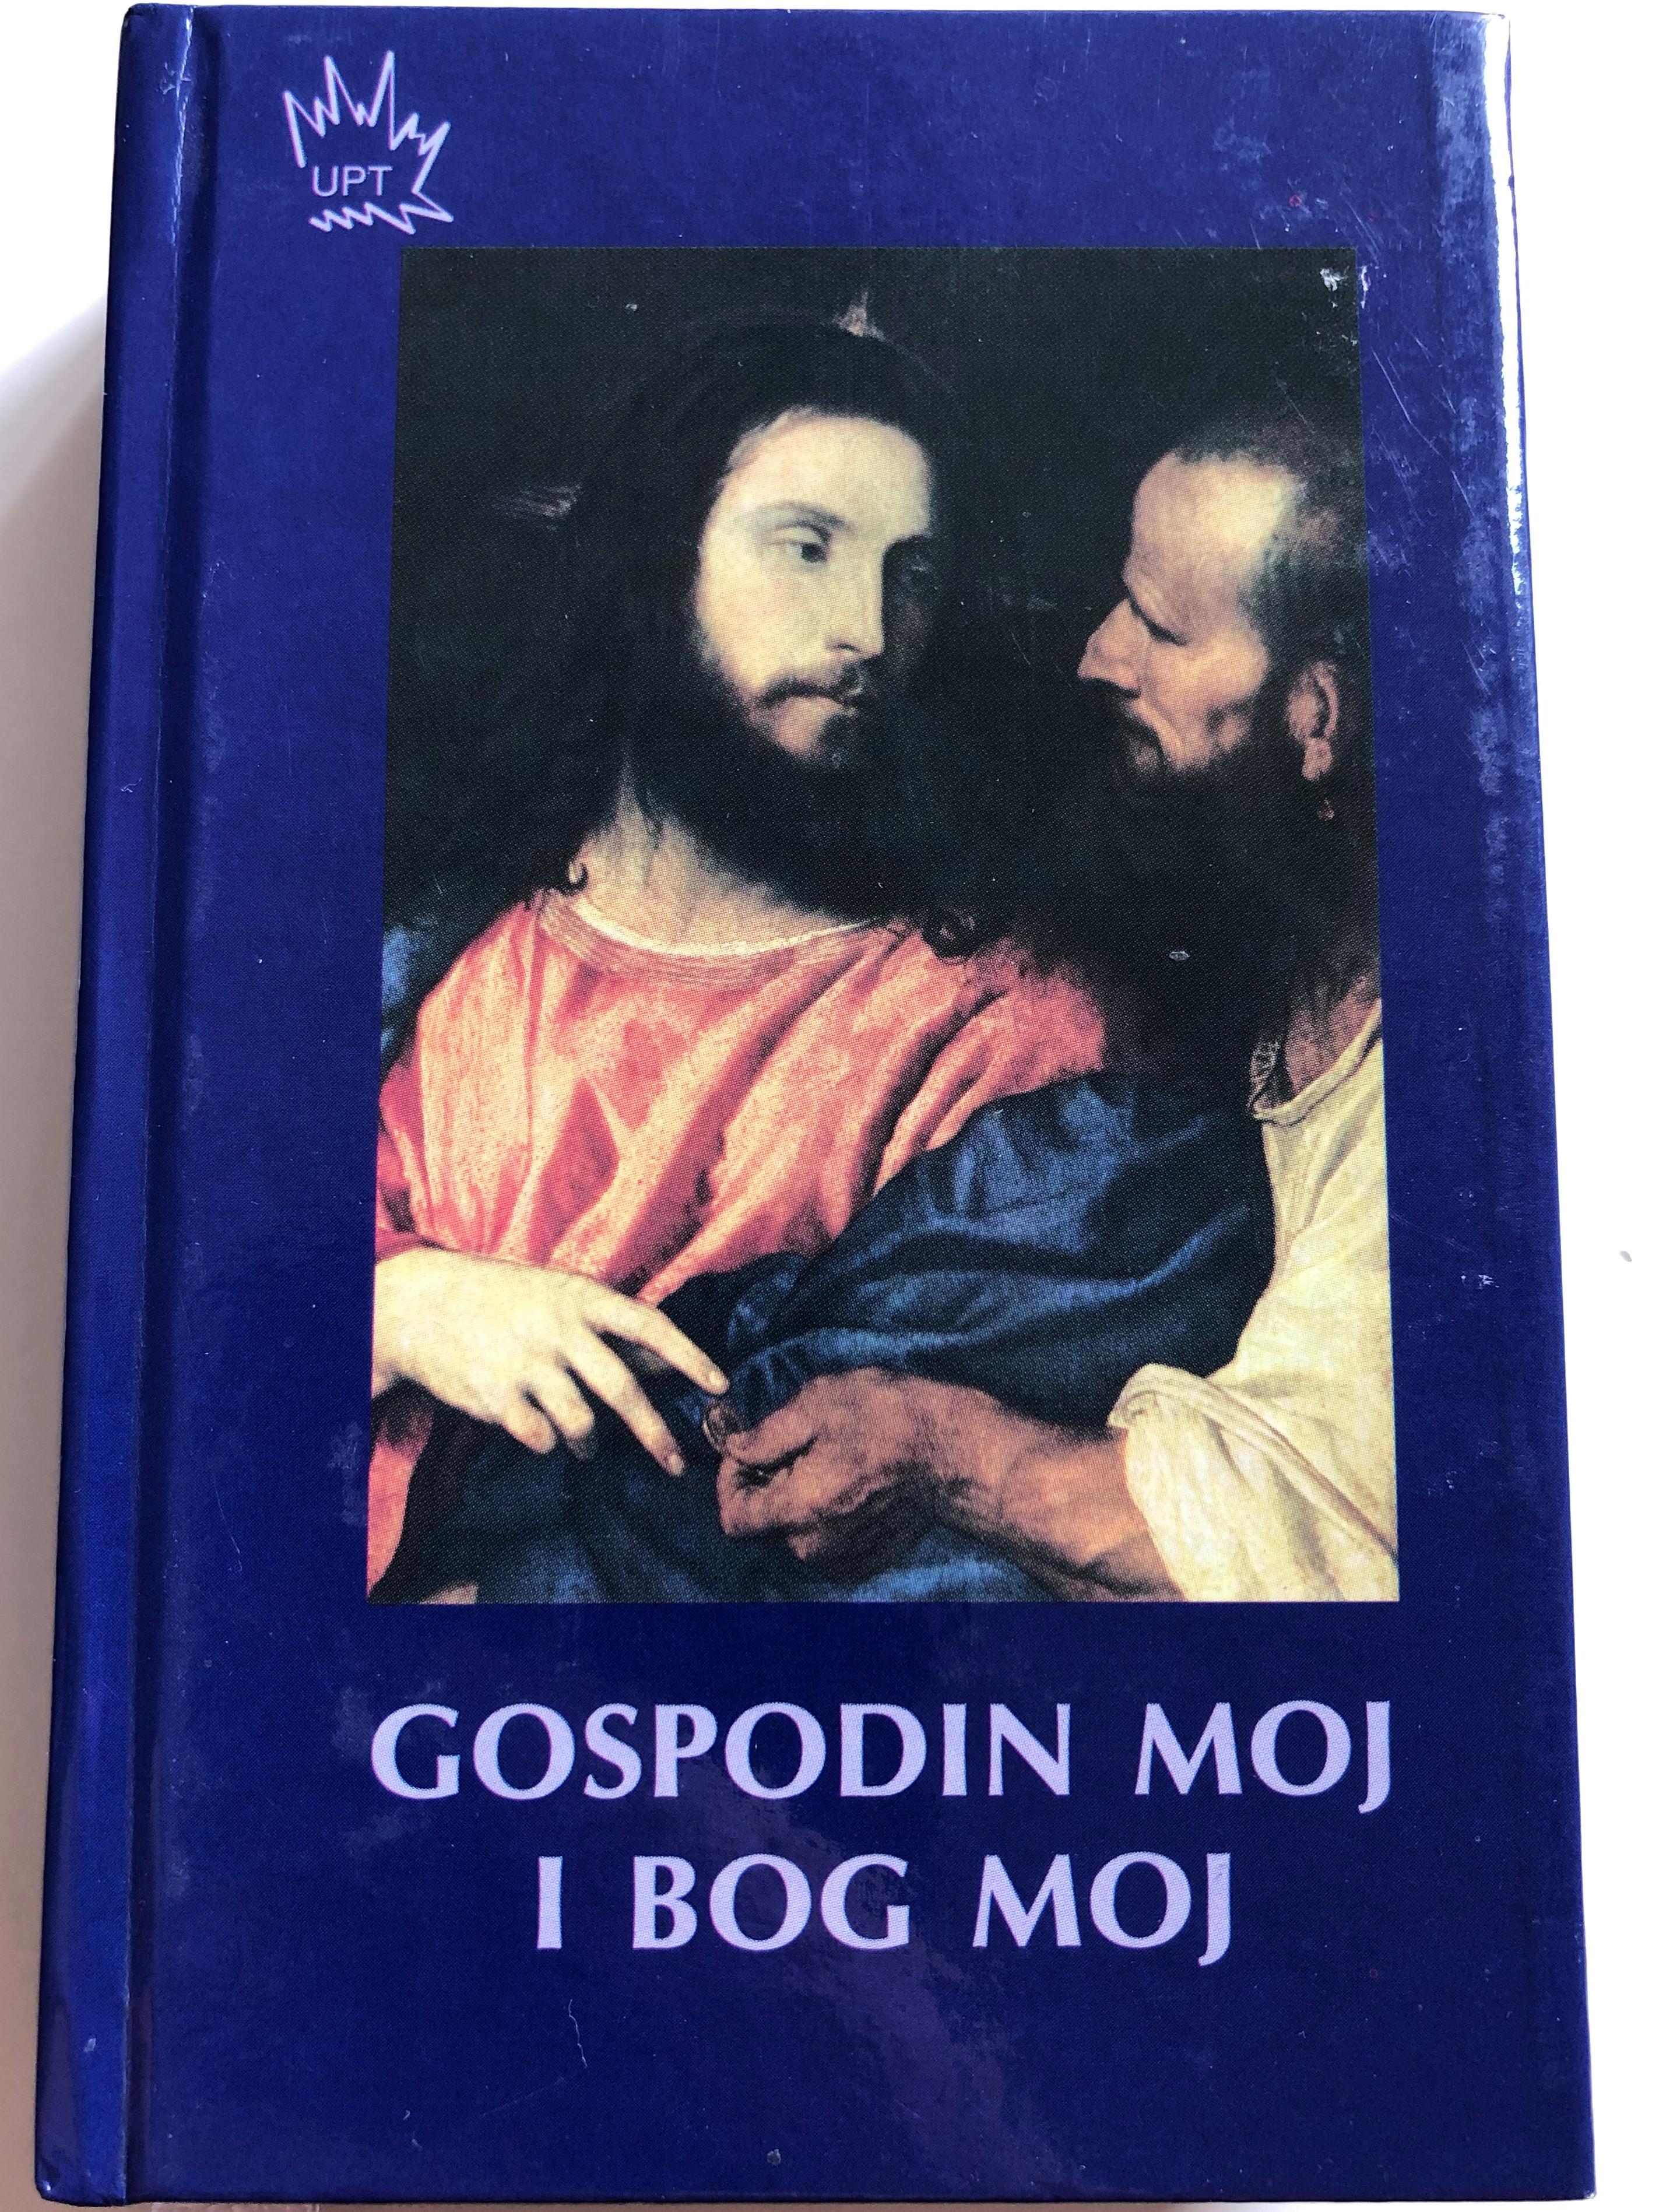 gospodin-moj-i-bog-moj-by-ivan-zirdum-my-lord-and-my-god-1.jpg